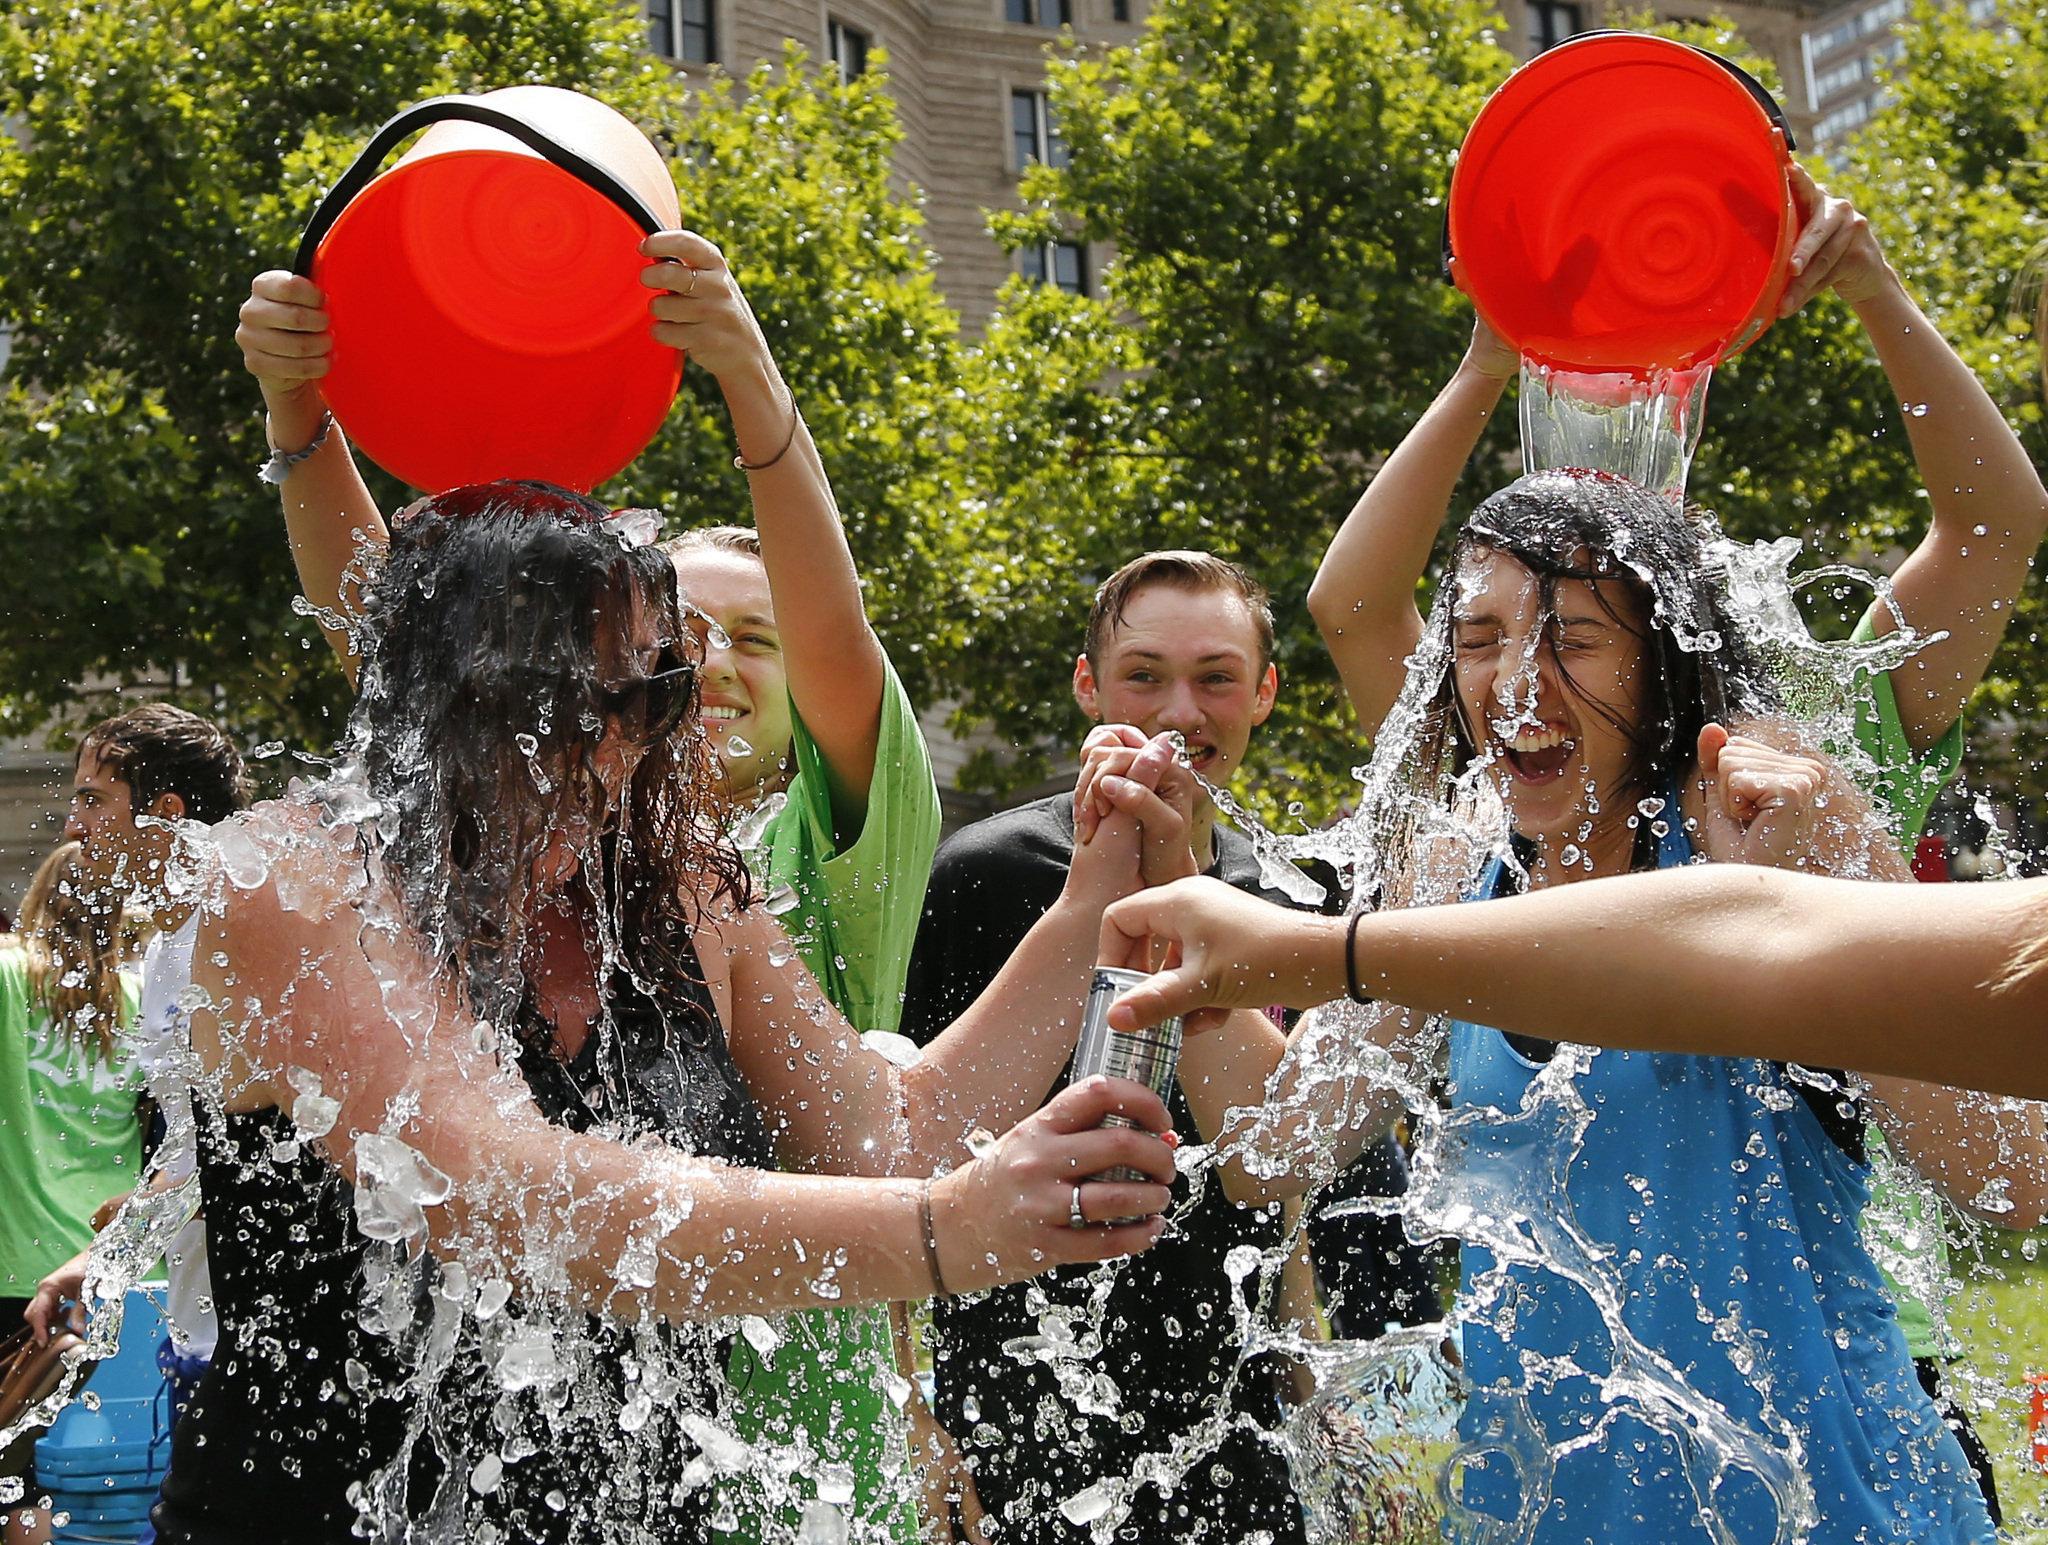 ice-bucket-challenge-90ba5cb552483002.jpg